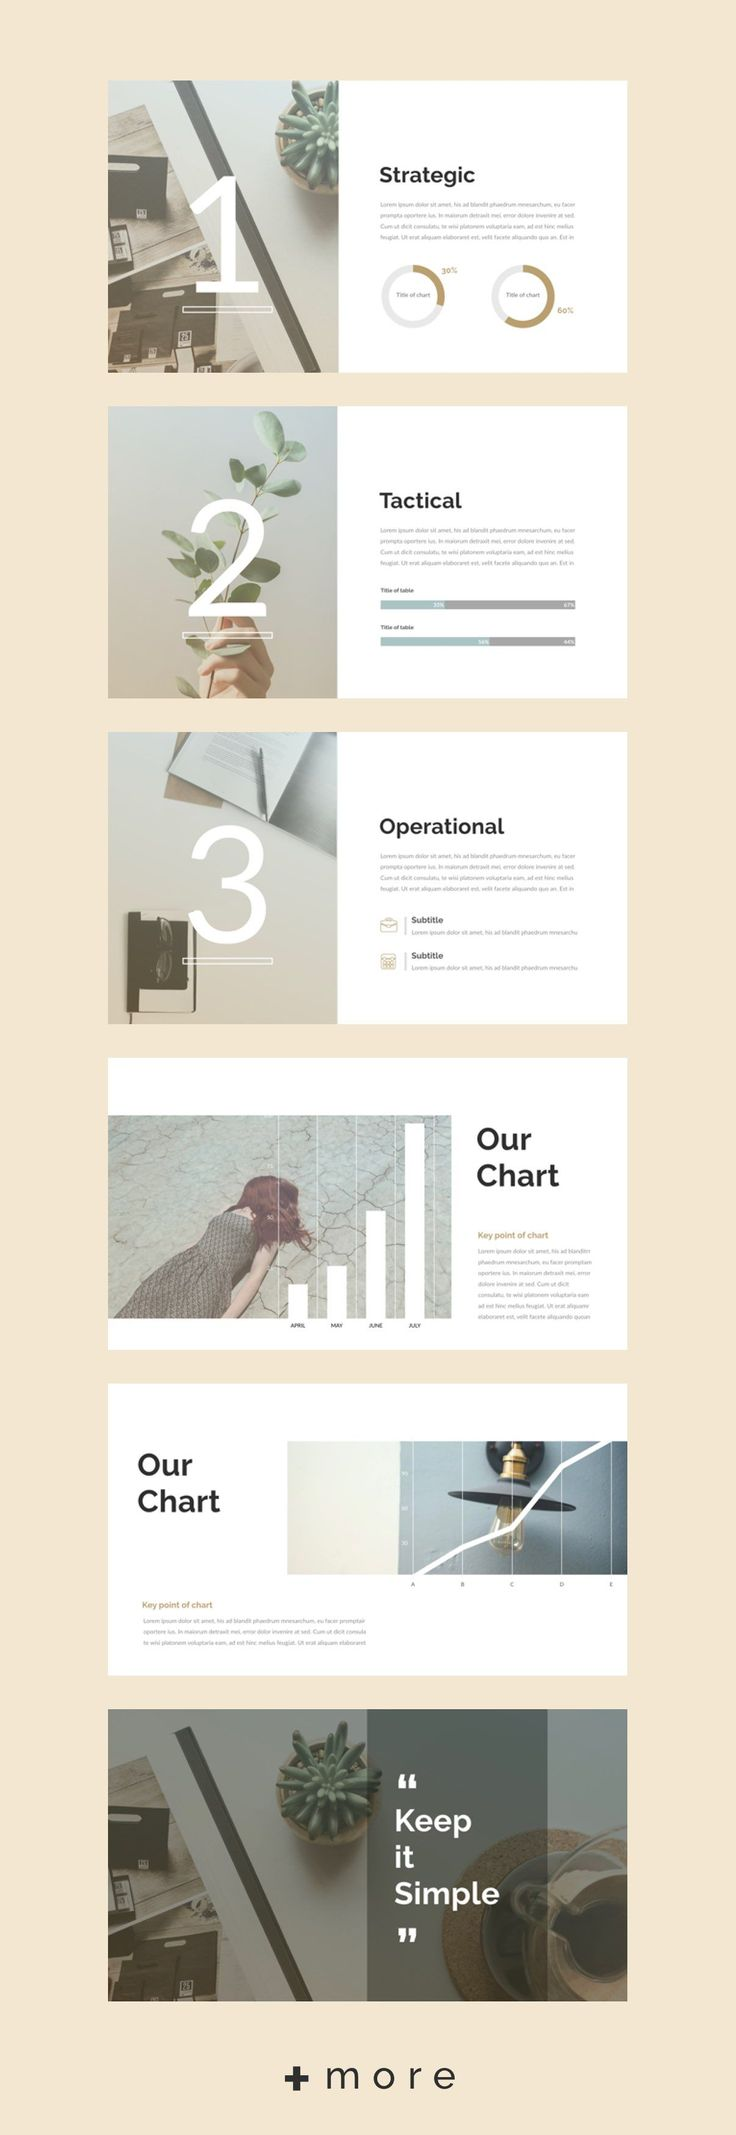 Presentation template: simple business planning #keynote #ppt #marketing